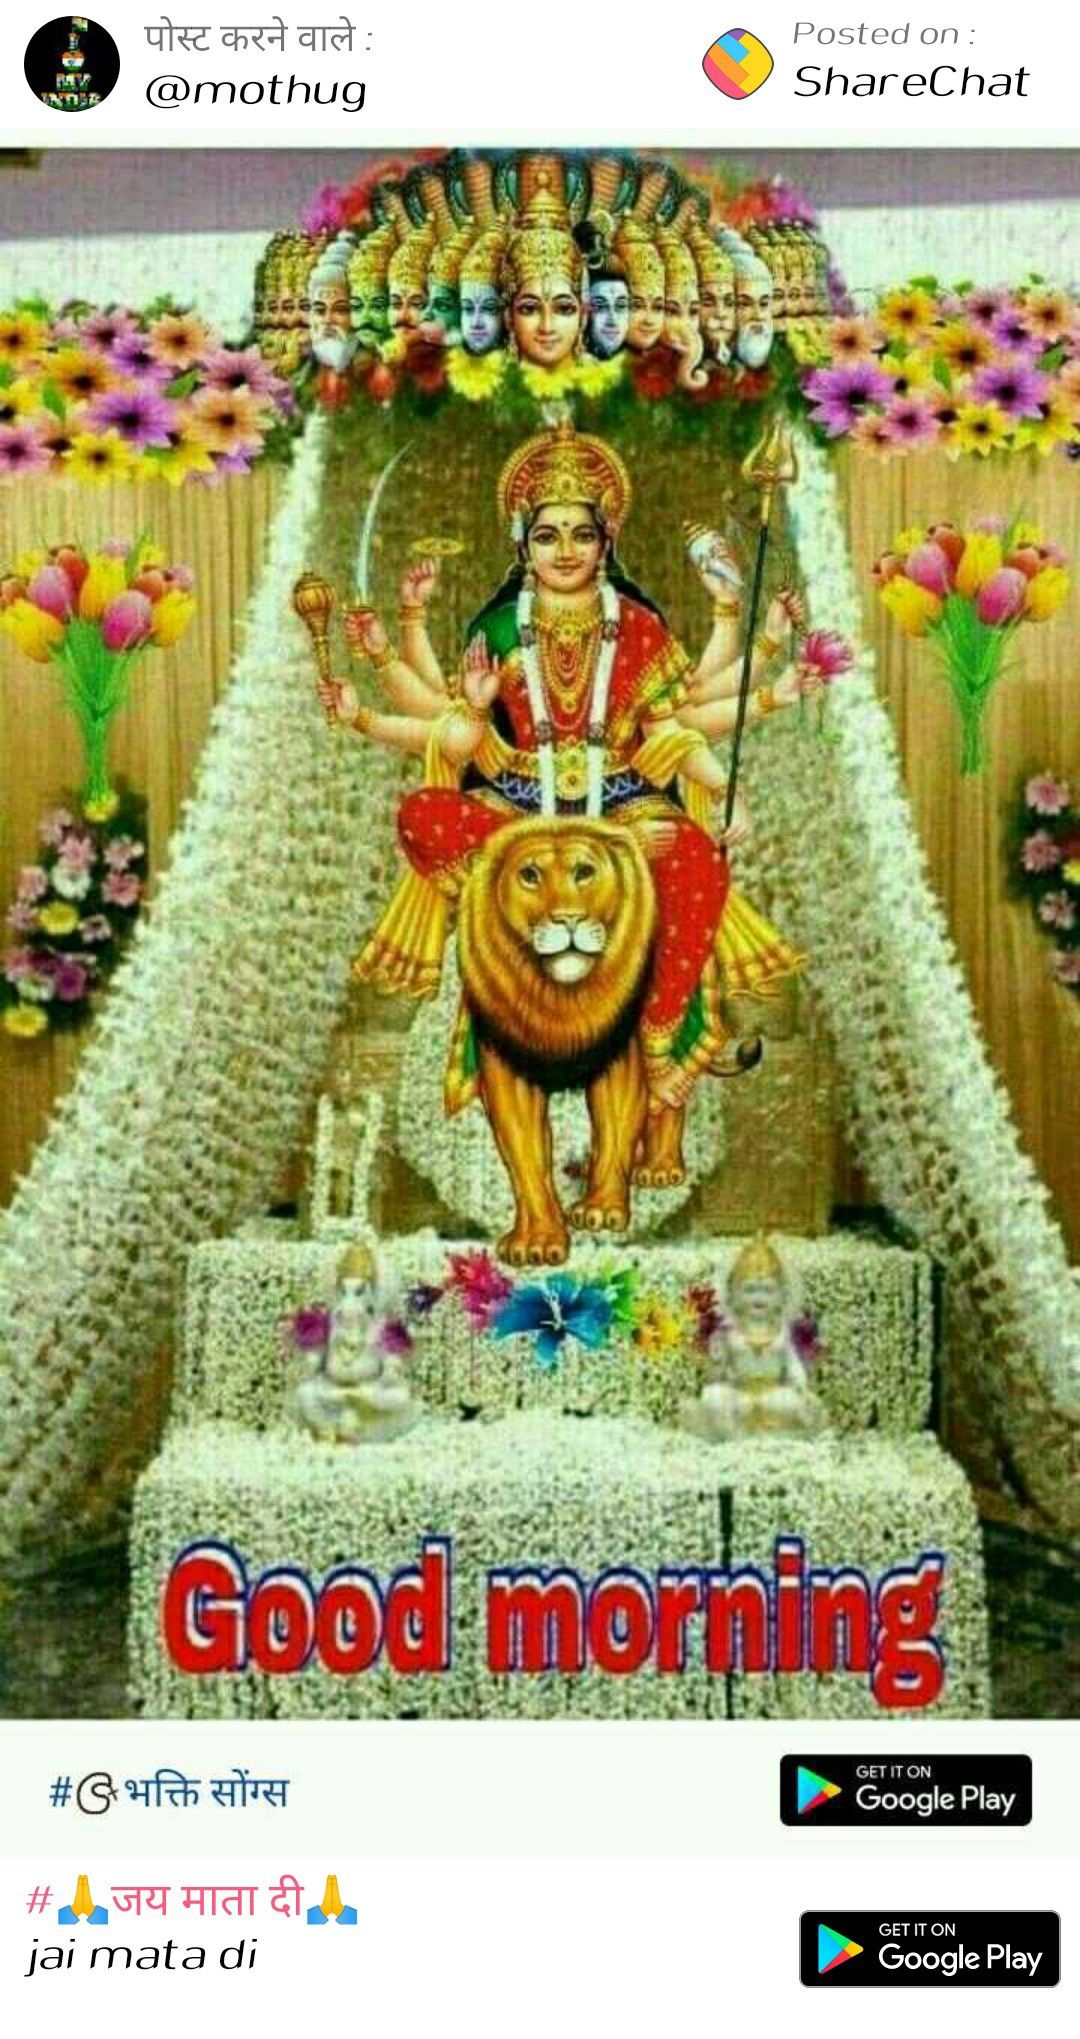 Pin by Narendra Pal Singh on Ambe maa | Good morning